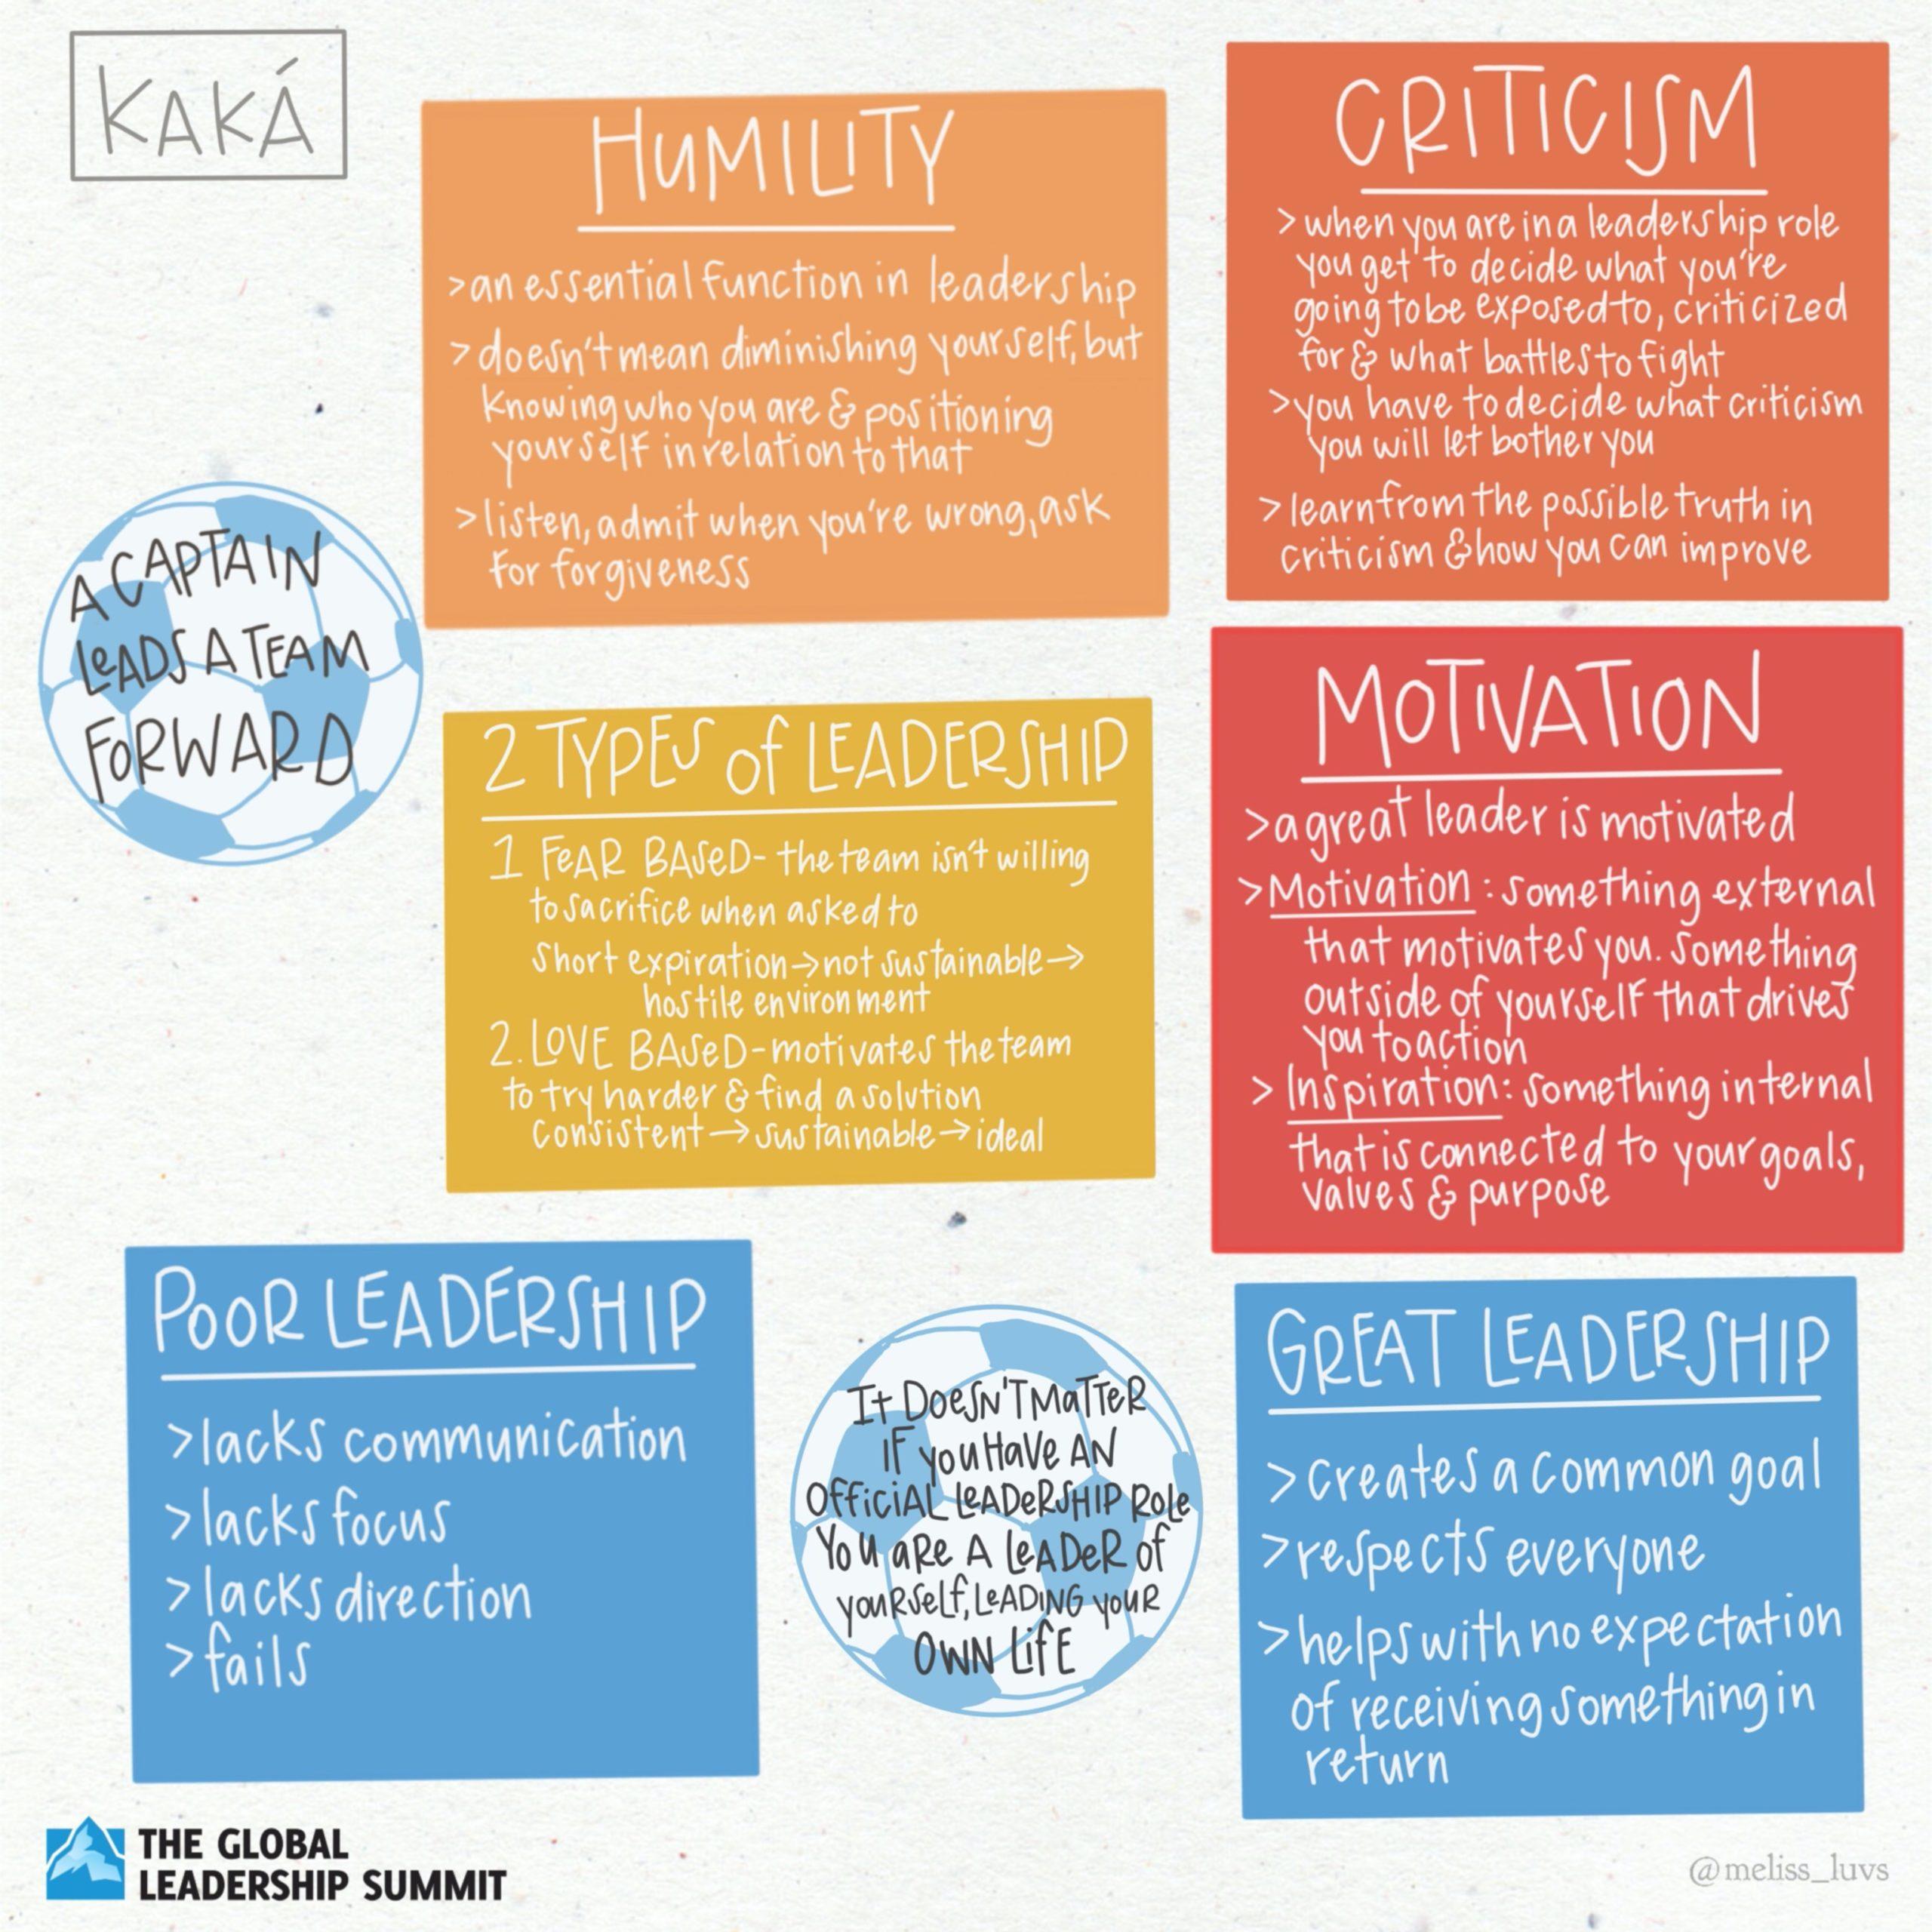 GLS20 Kaka Illustrative Summary